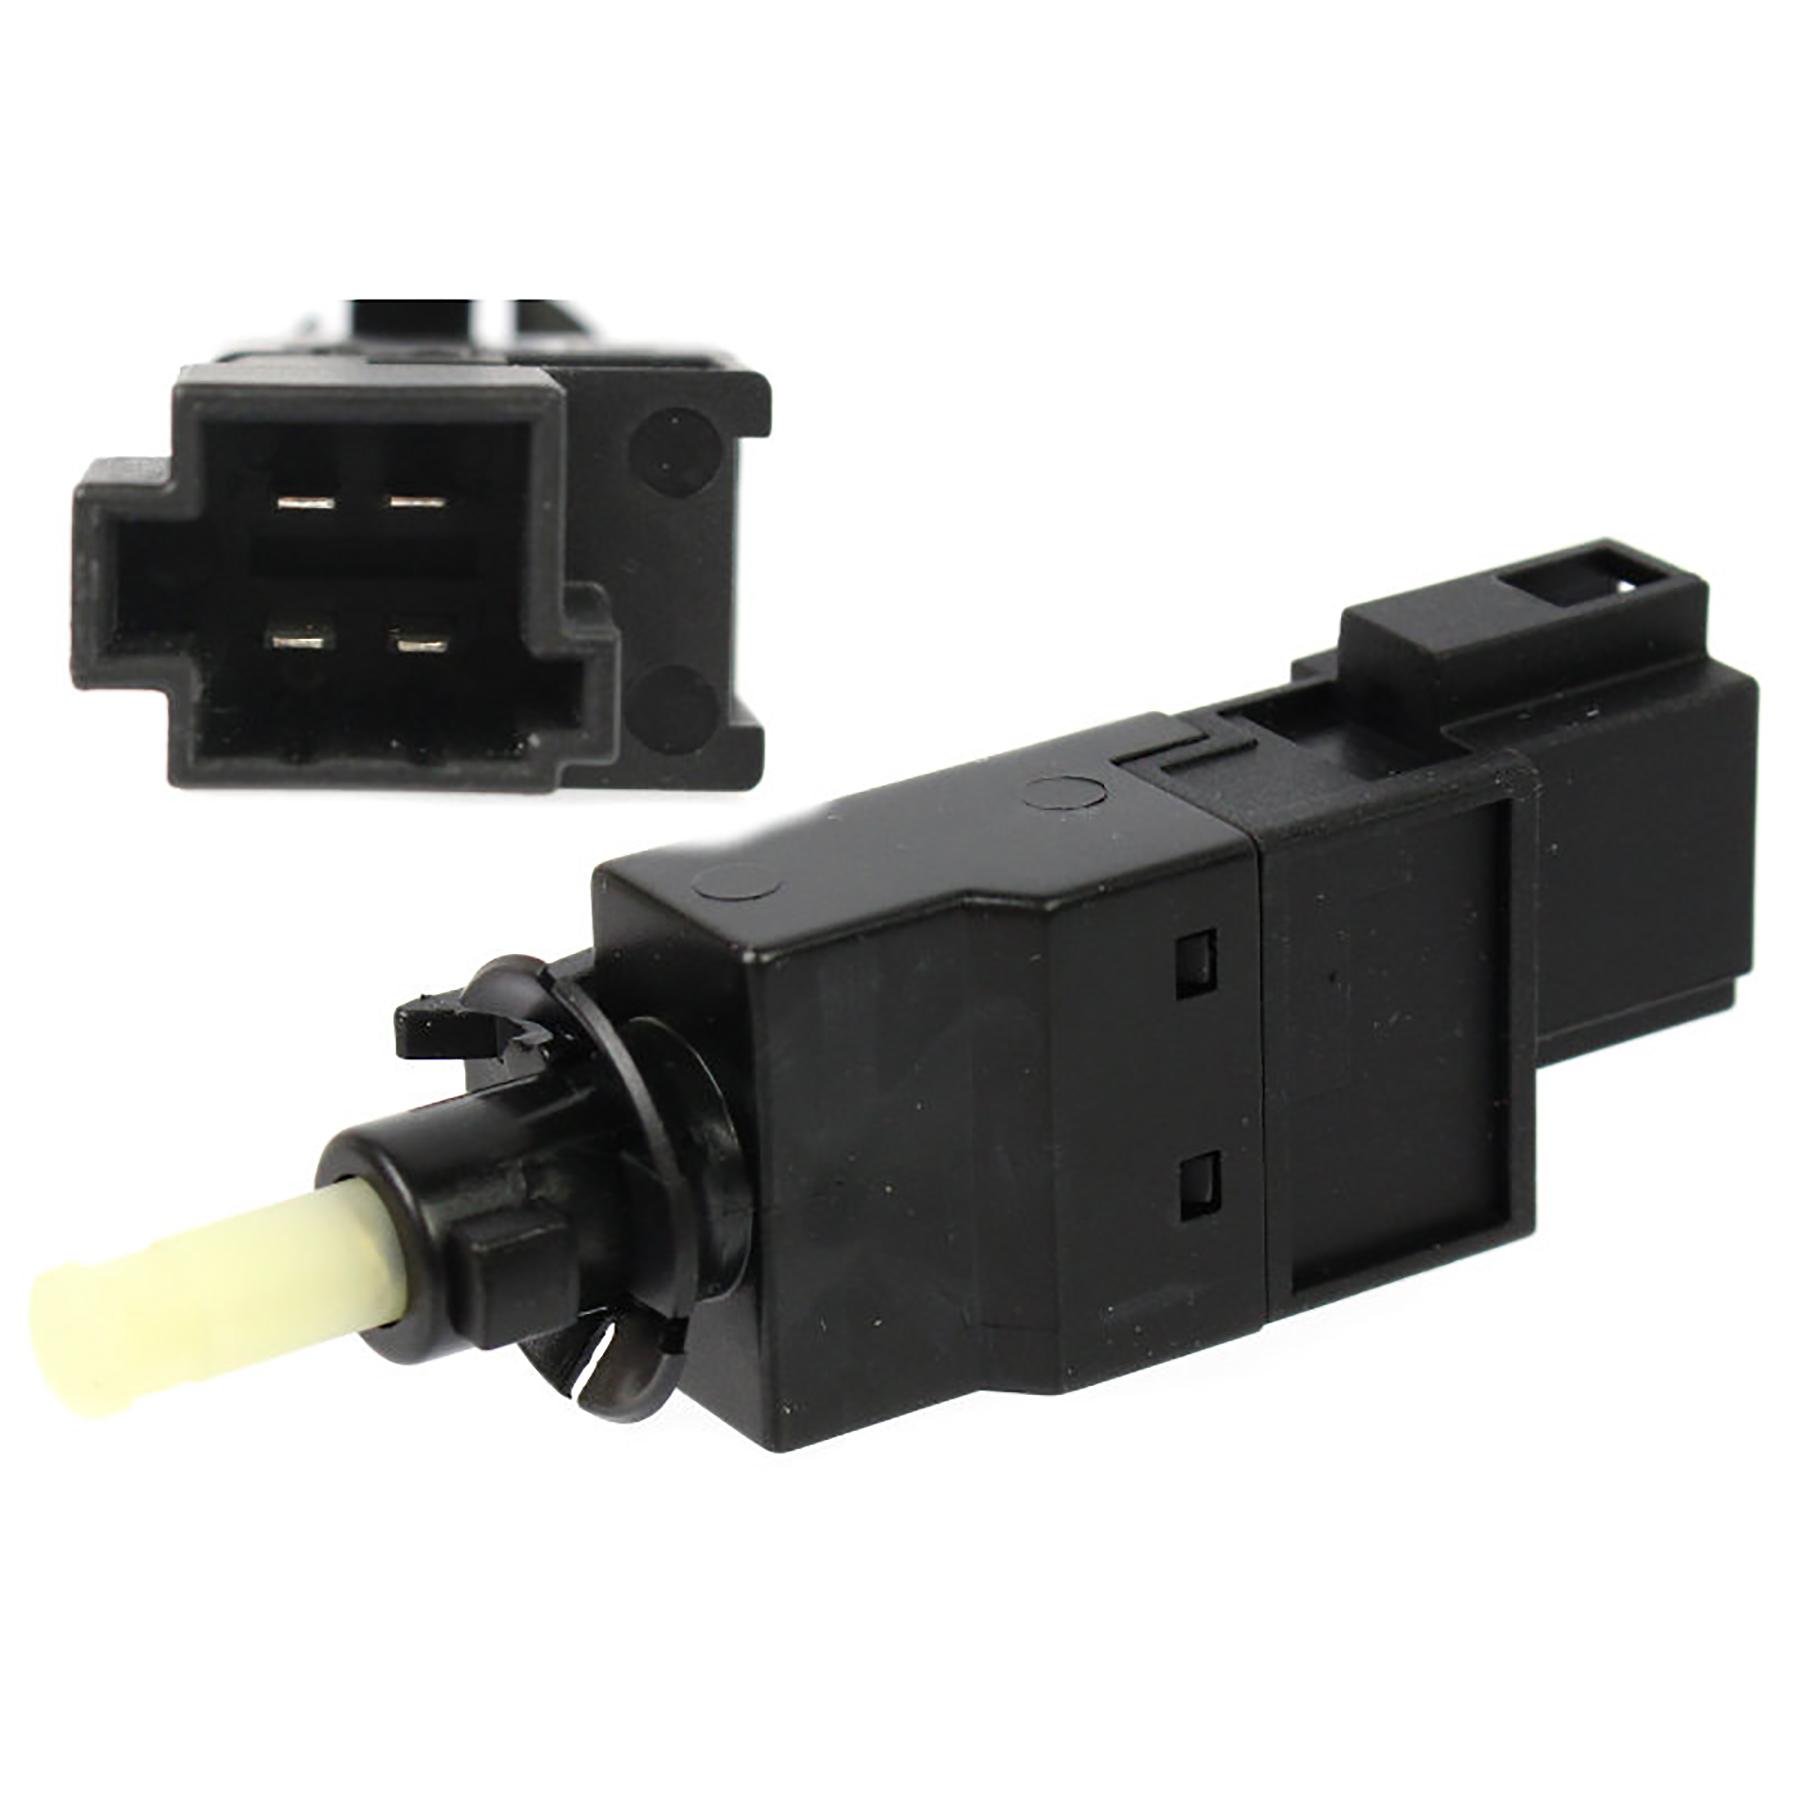 MB A B C M V Vaneo Viano Vito Sprinter Brake Light Switch Stop 4 Pin 0015452009*